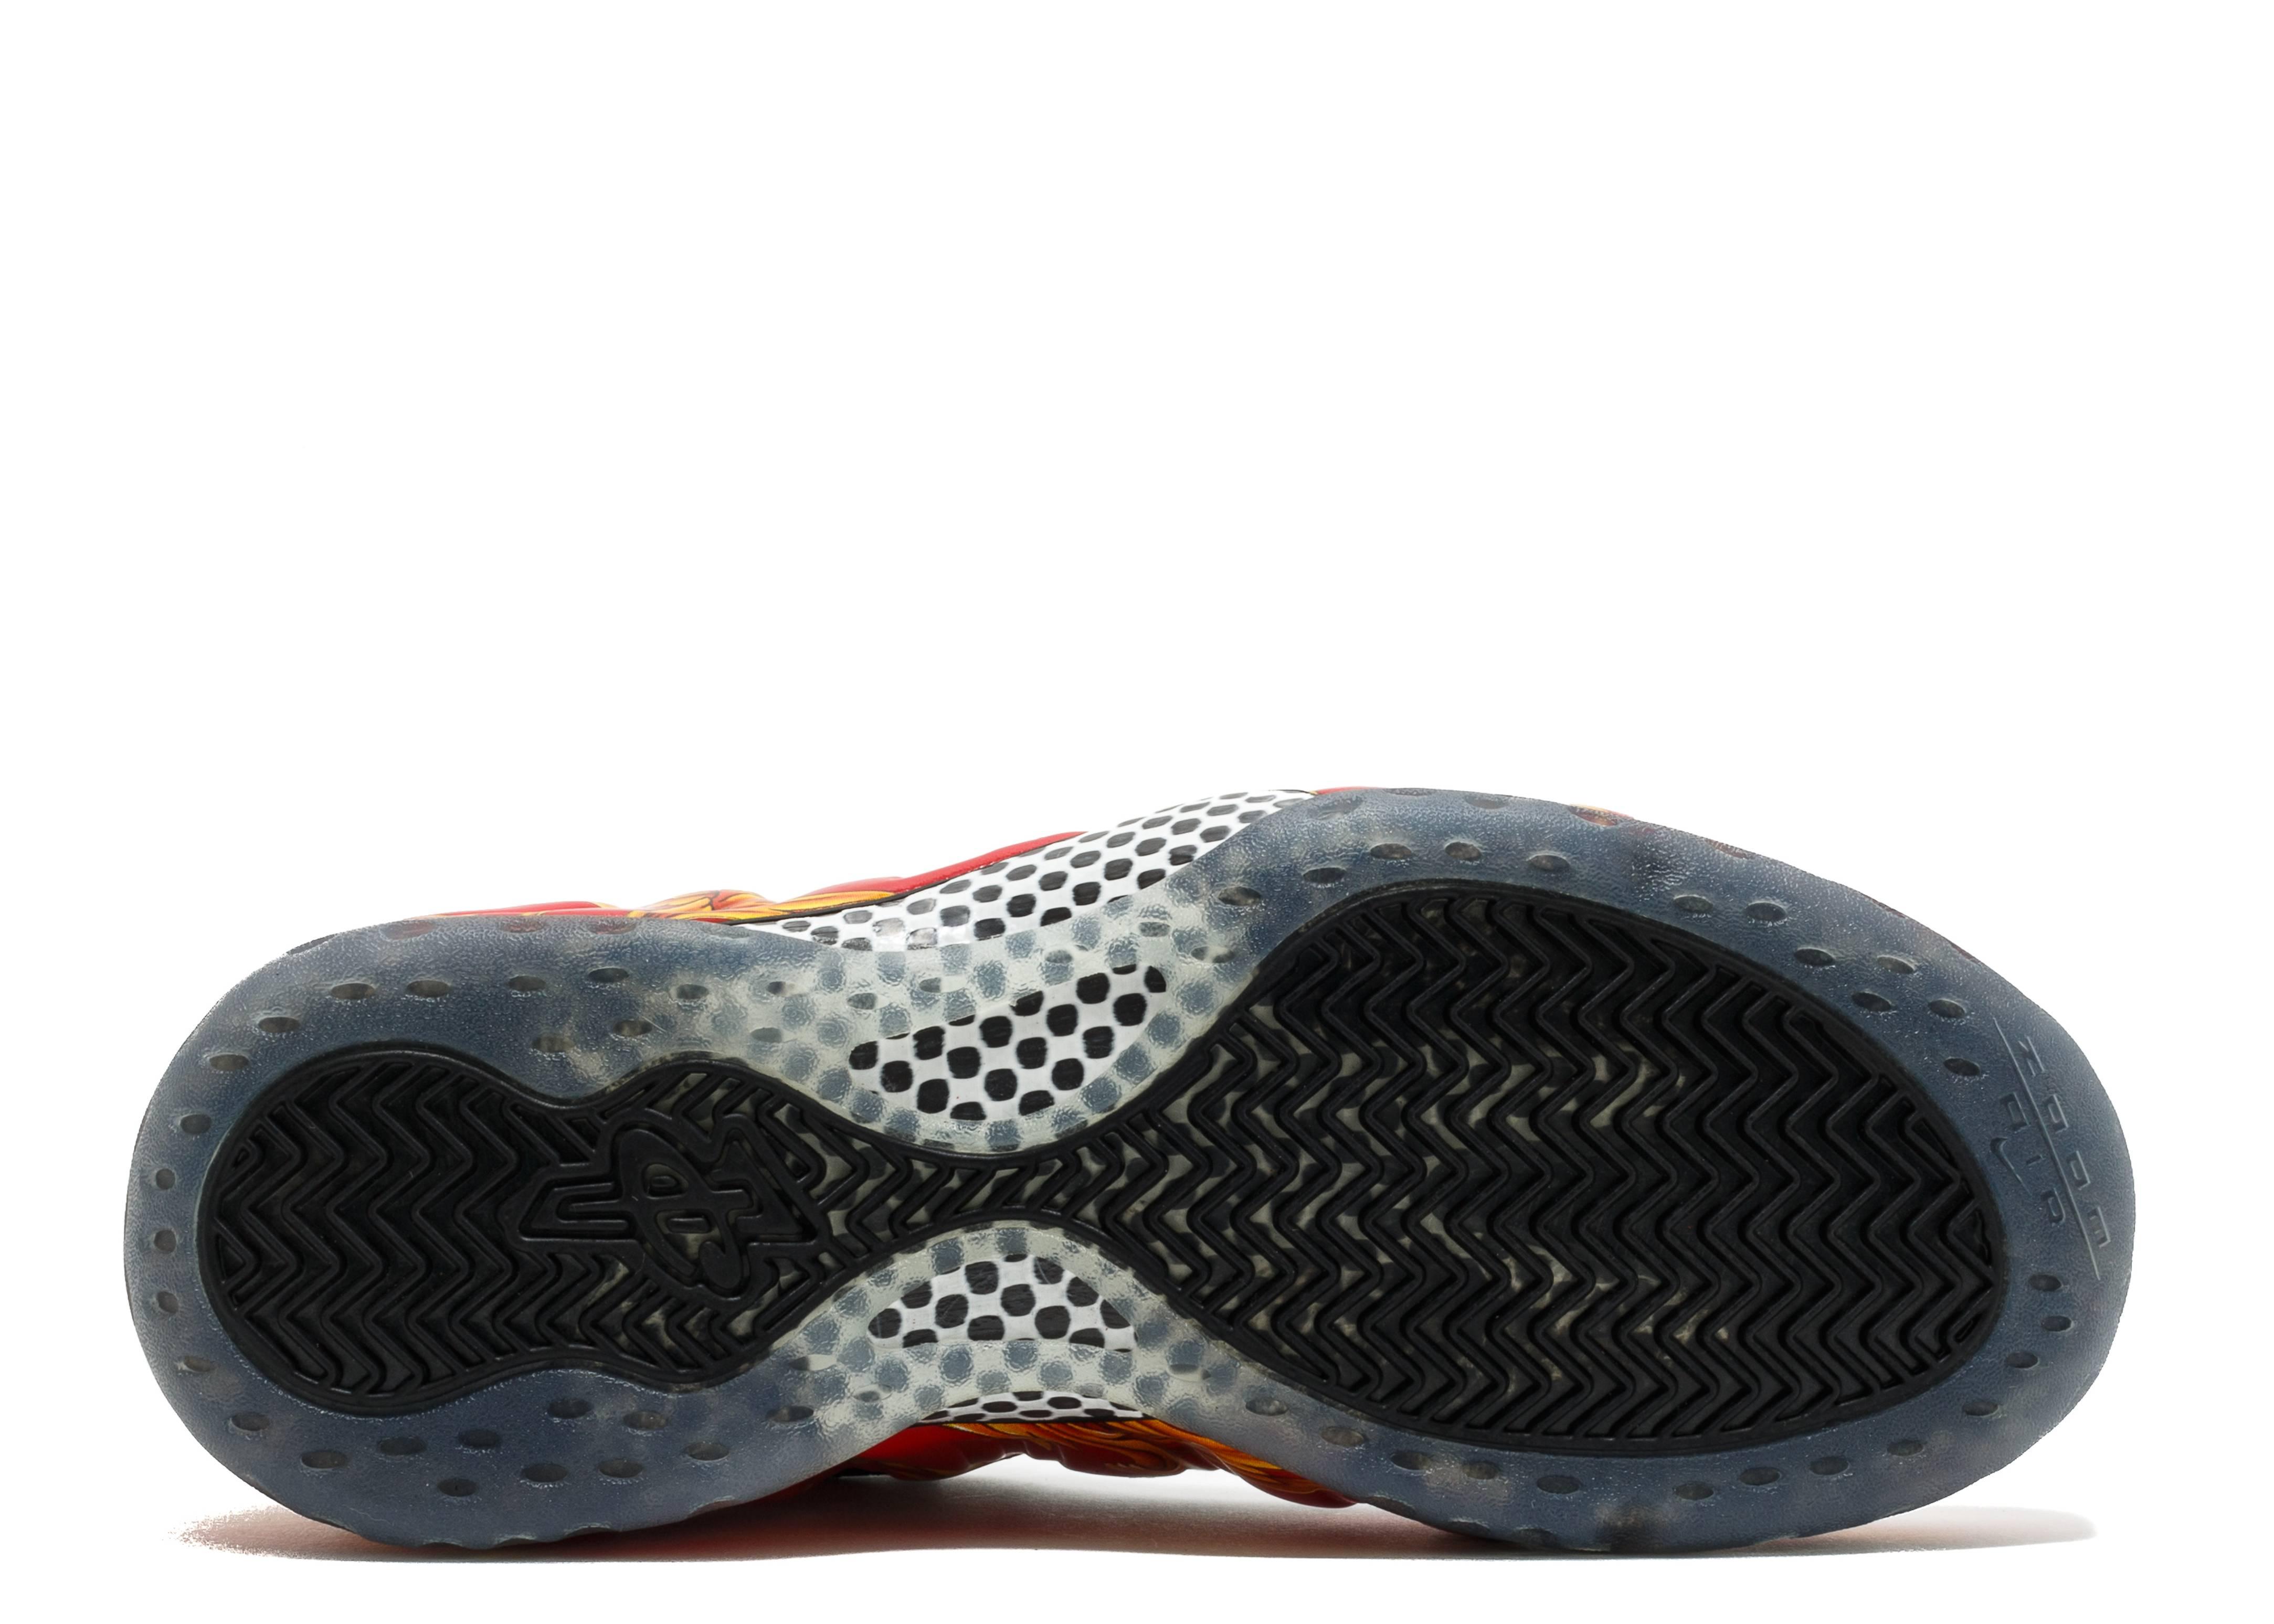 Foot LockerFresh Denims. Nike Air Foamposite One ...